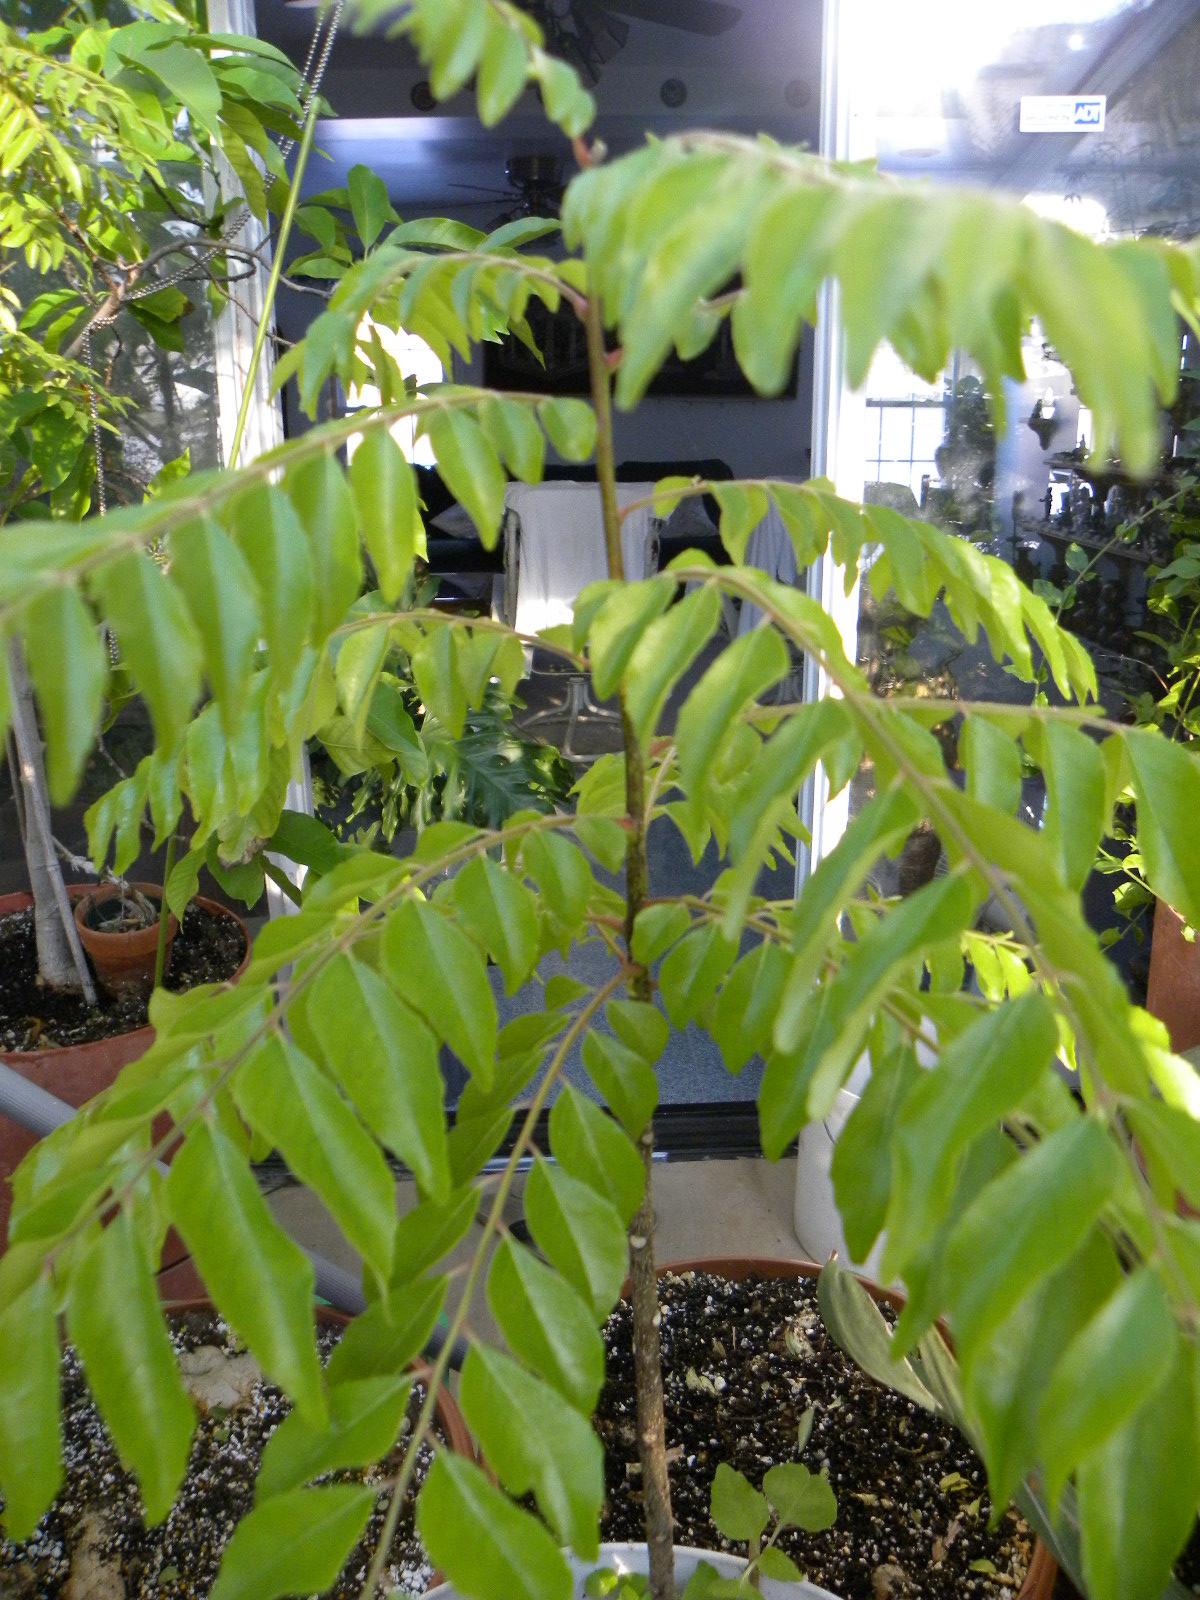 Peculiar Sale Curry Leaf Tree Melbourne 5389 Curry Leaf Plant Pruning Curry Leaf Plant houzz-02 Curry Leaf Plant